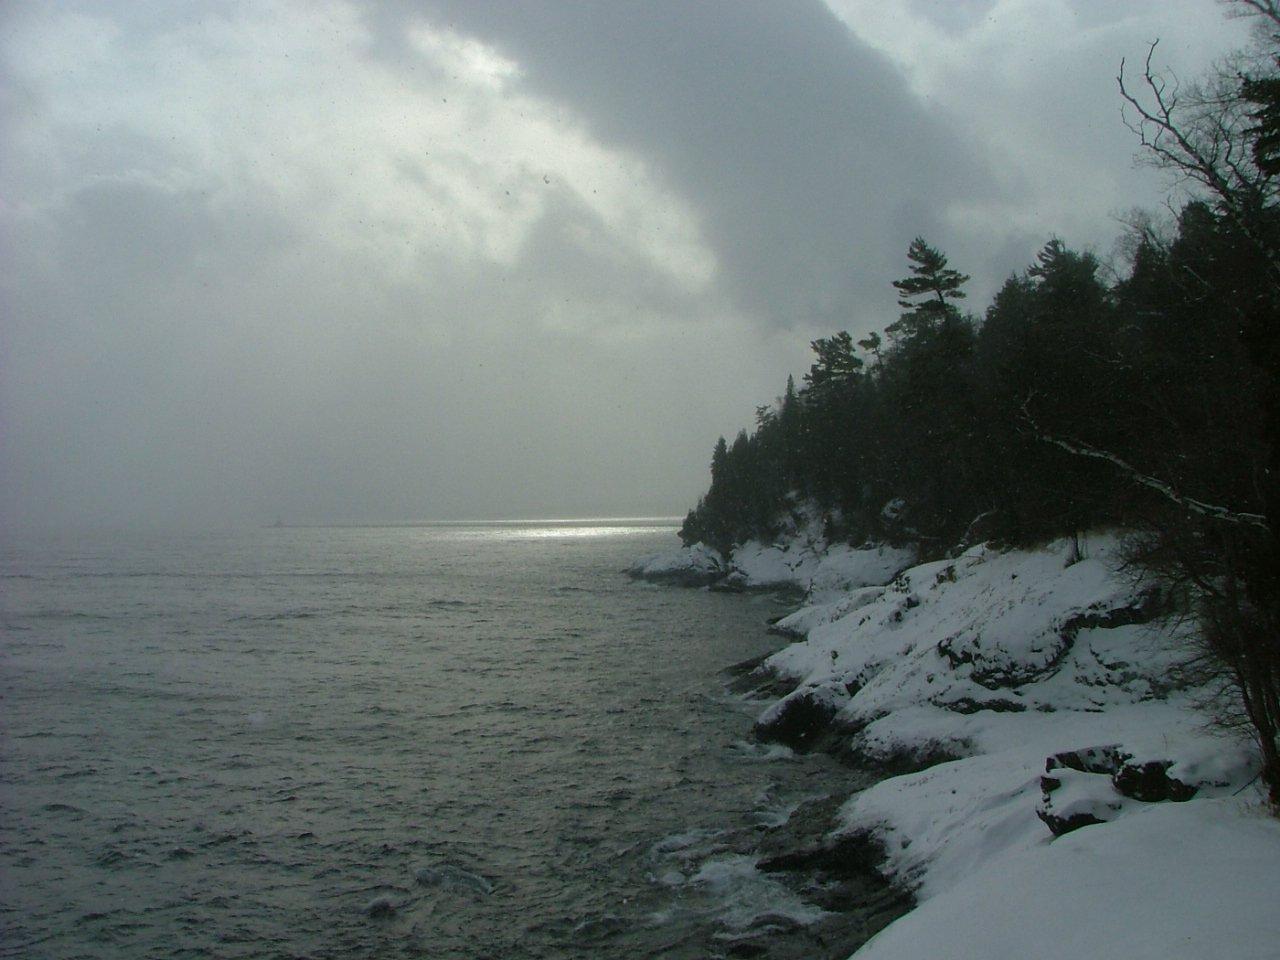 Winter storm over Presque Isle